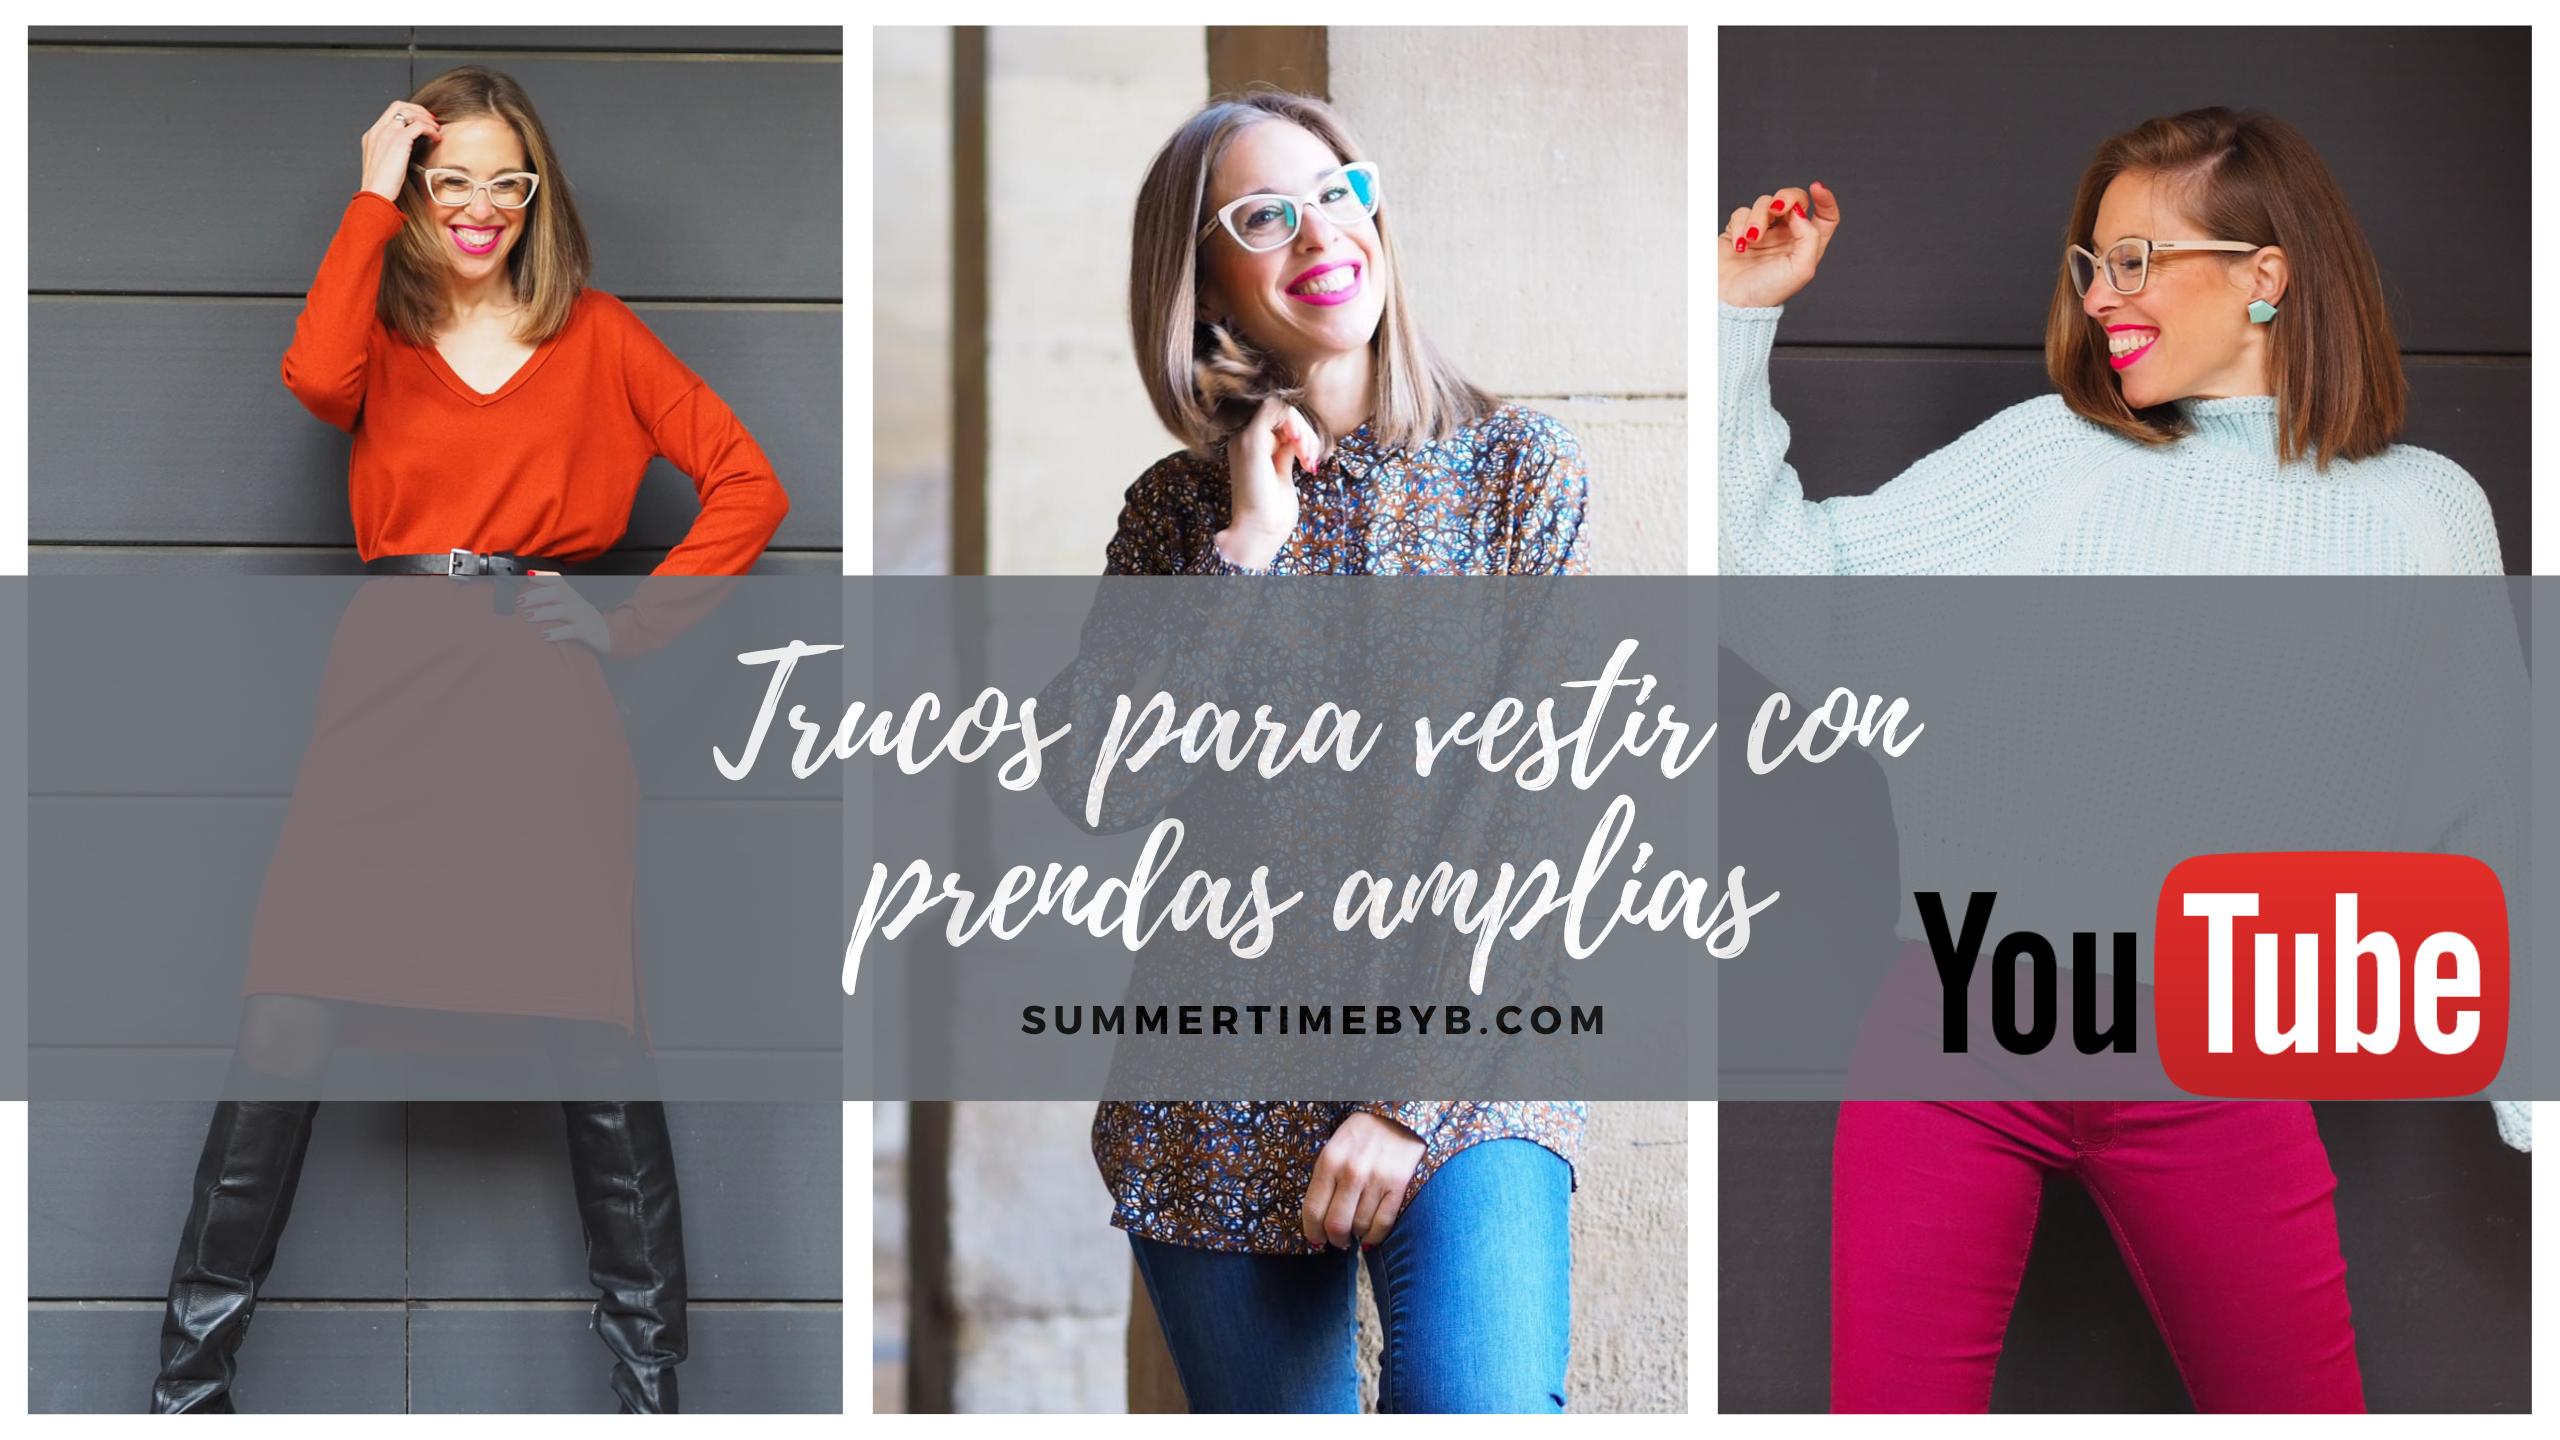 En este momento estás viendo VIDEO EN YOUTUBE: trucos para vestir con prendas amplias